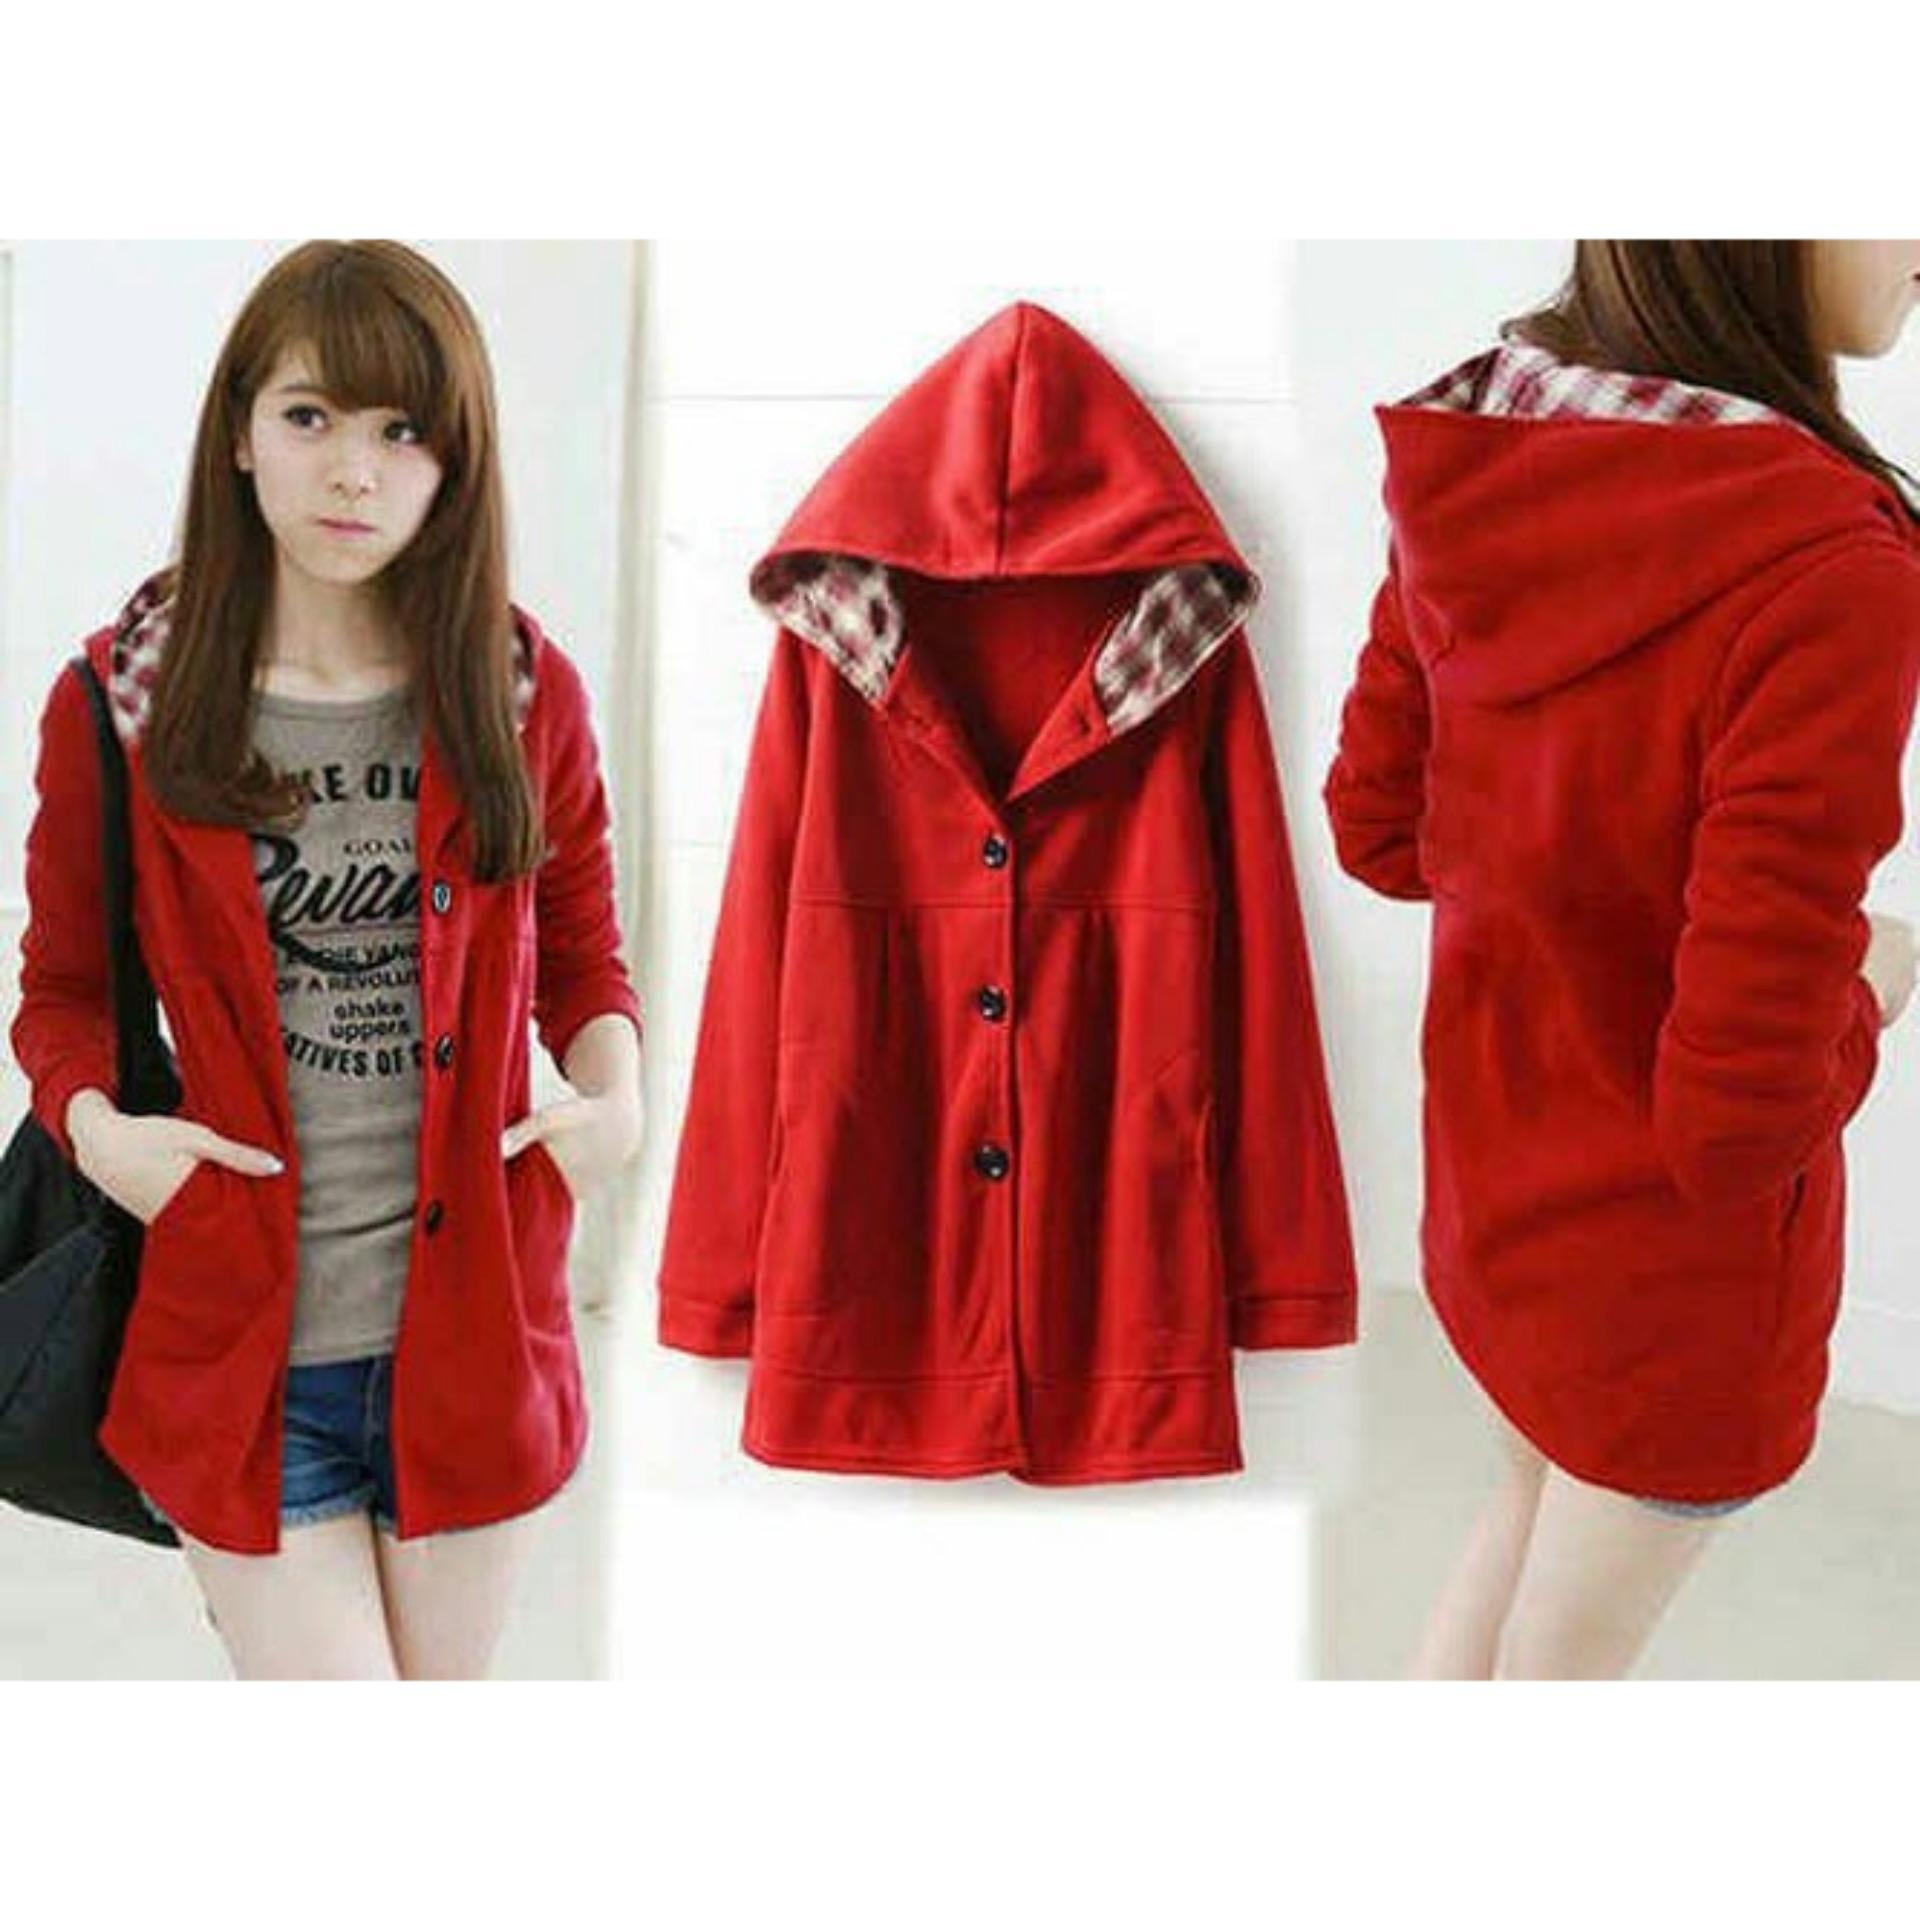 Flash Sale Flavia Store Jaket Hoodie Wanita FS0412 - MERAH / Sweater / Rnmelda